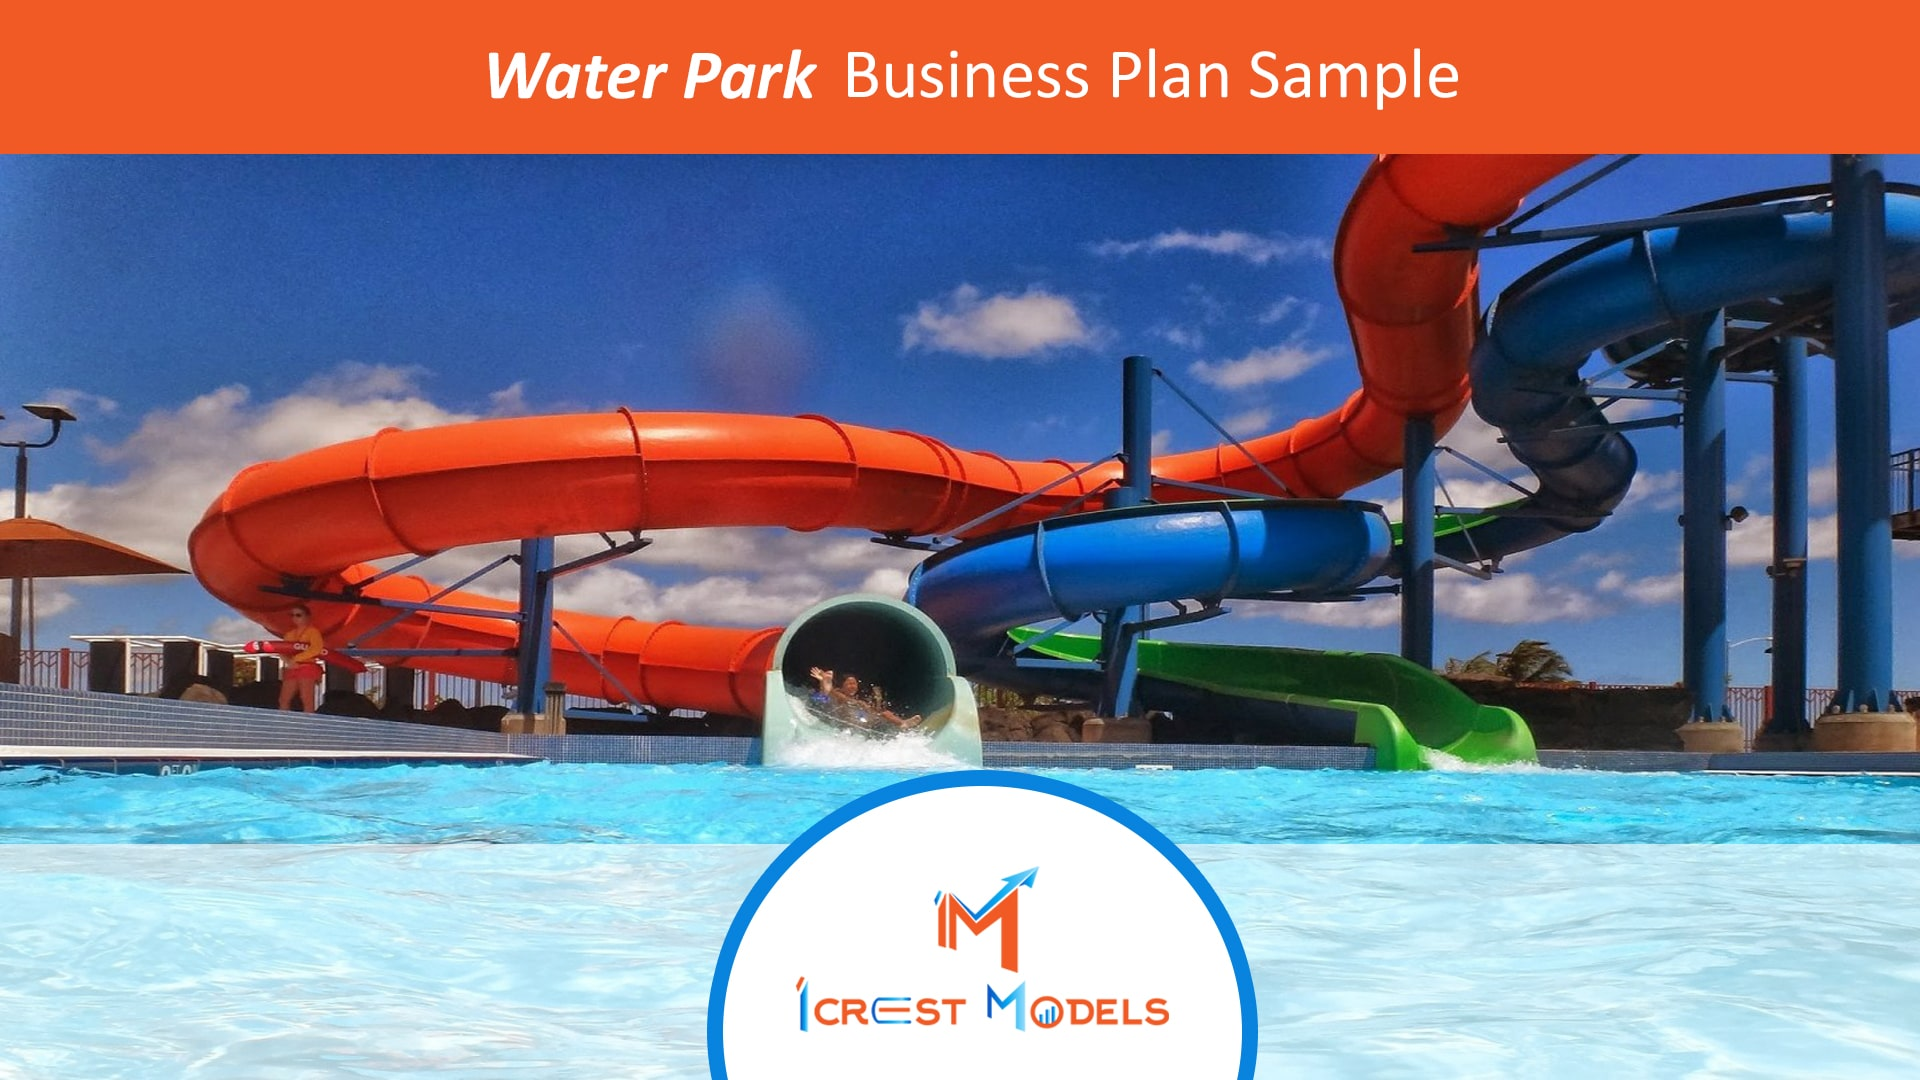 Water Park Business Plan